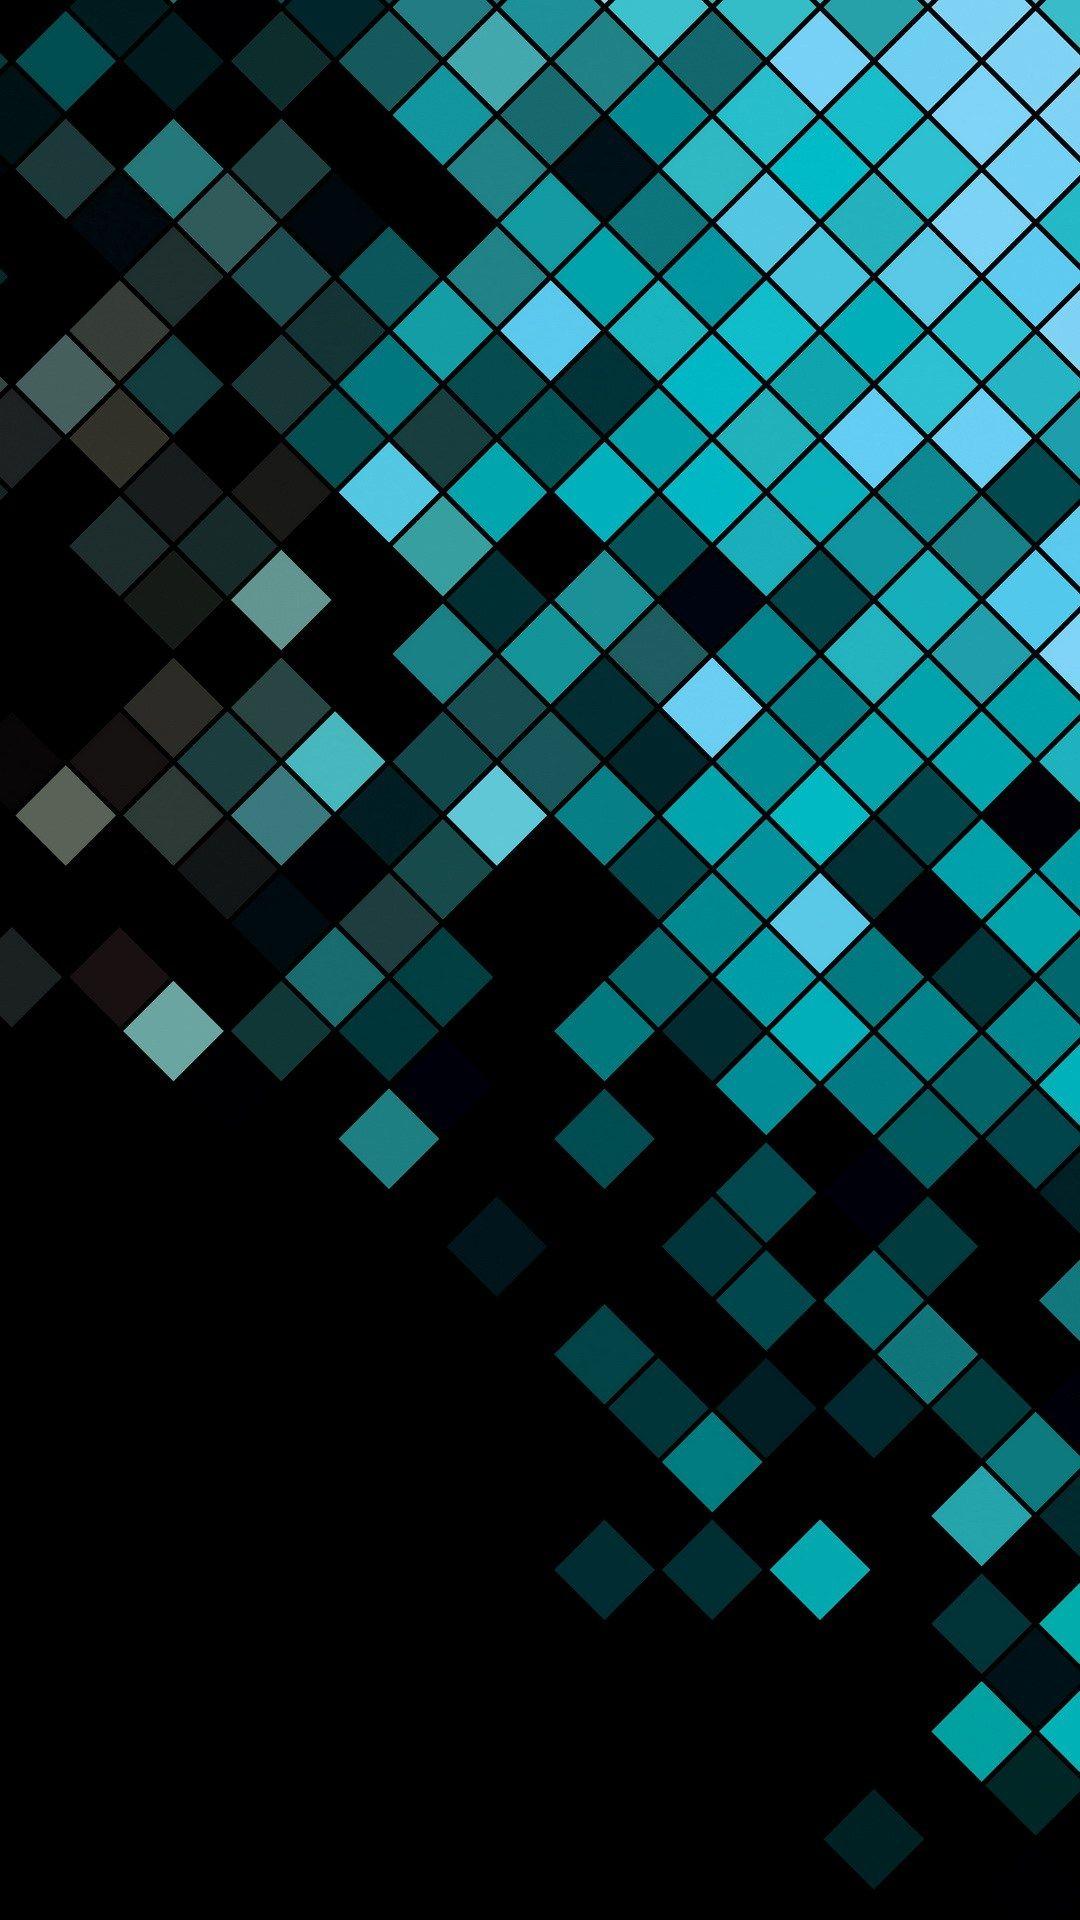 Wallpaper iphone retina - Iphone 6 Wallpaper Retina Bing Images